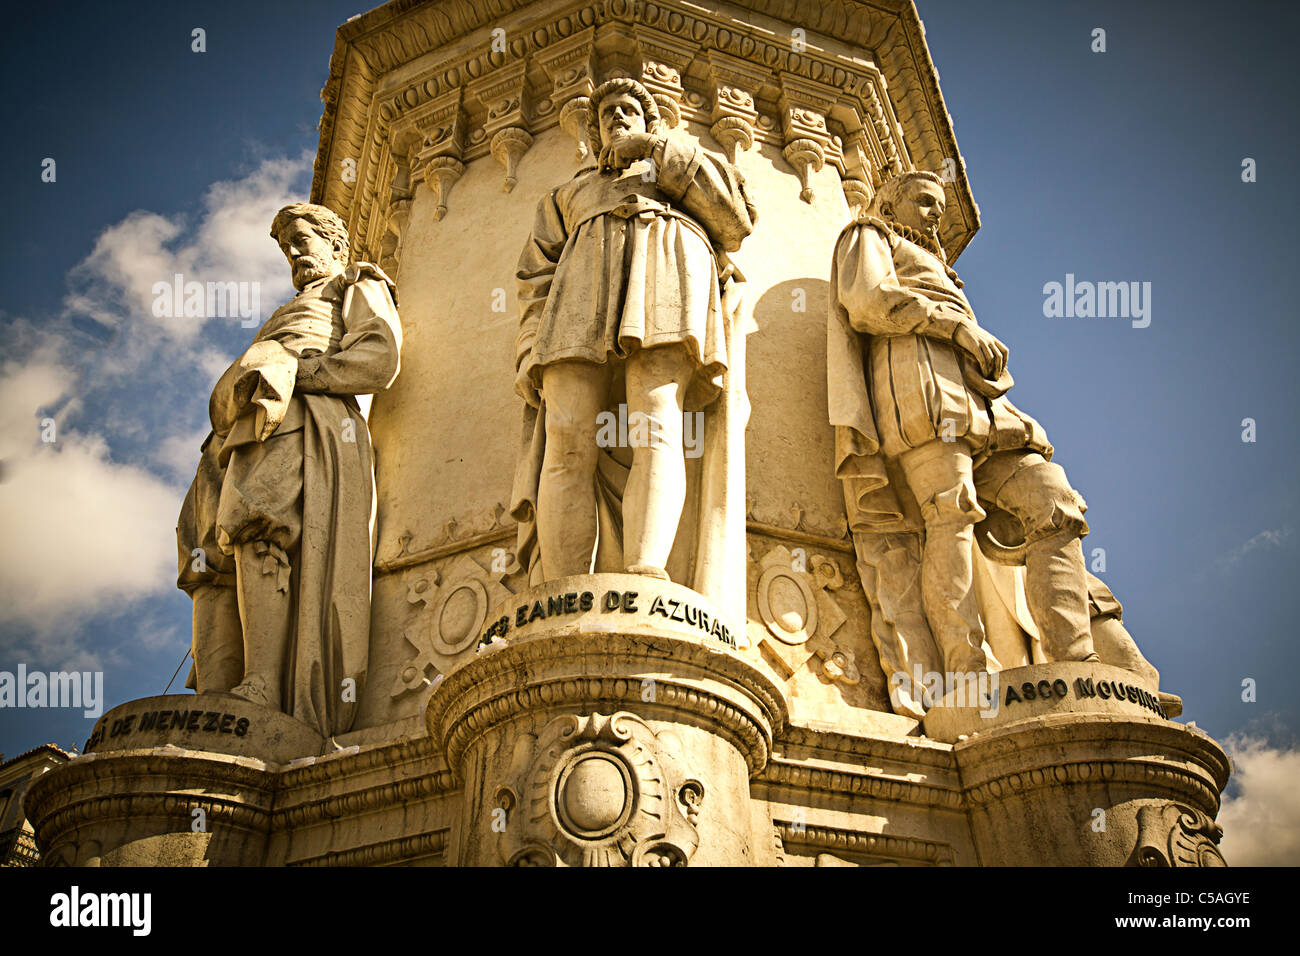 Epic Poets Statue in Praca de Camoes, Lisbon, Portugal - Stock Image